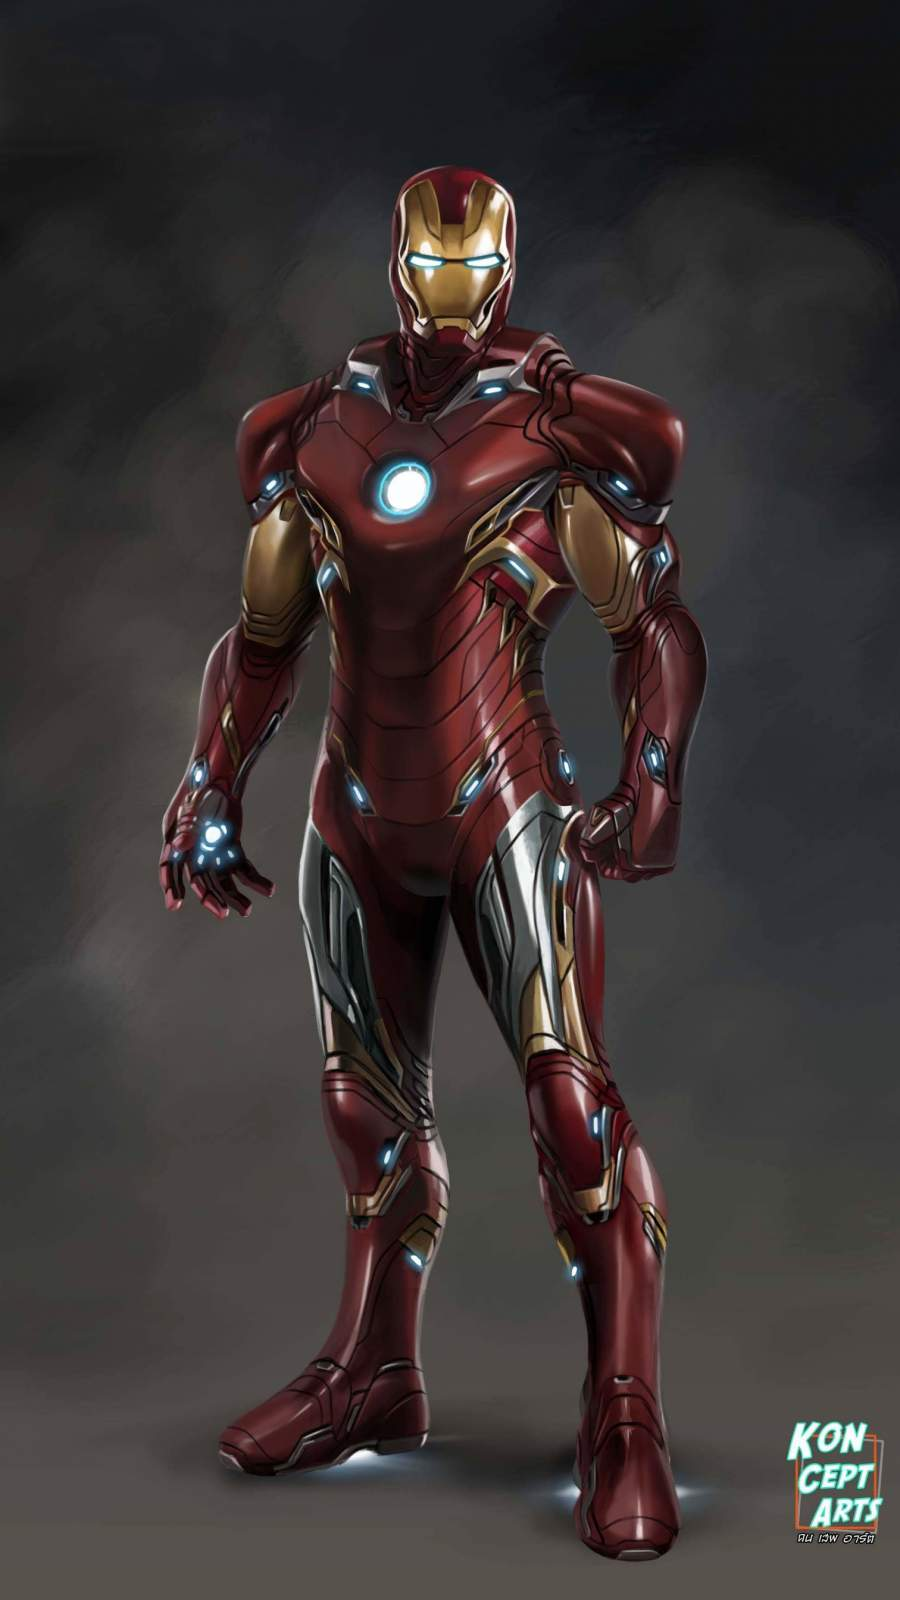 Wallpaper Iphone 6 Iron Man The Iron Man Mk 85 Armor Iphone Wallpaper Iphone Wallpapers